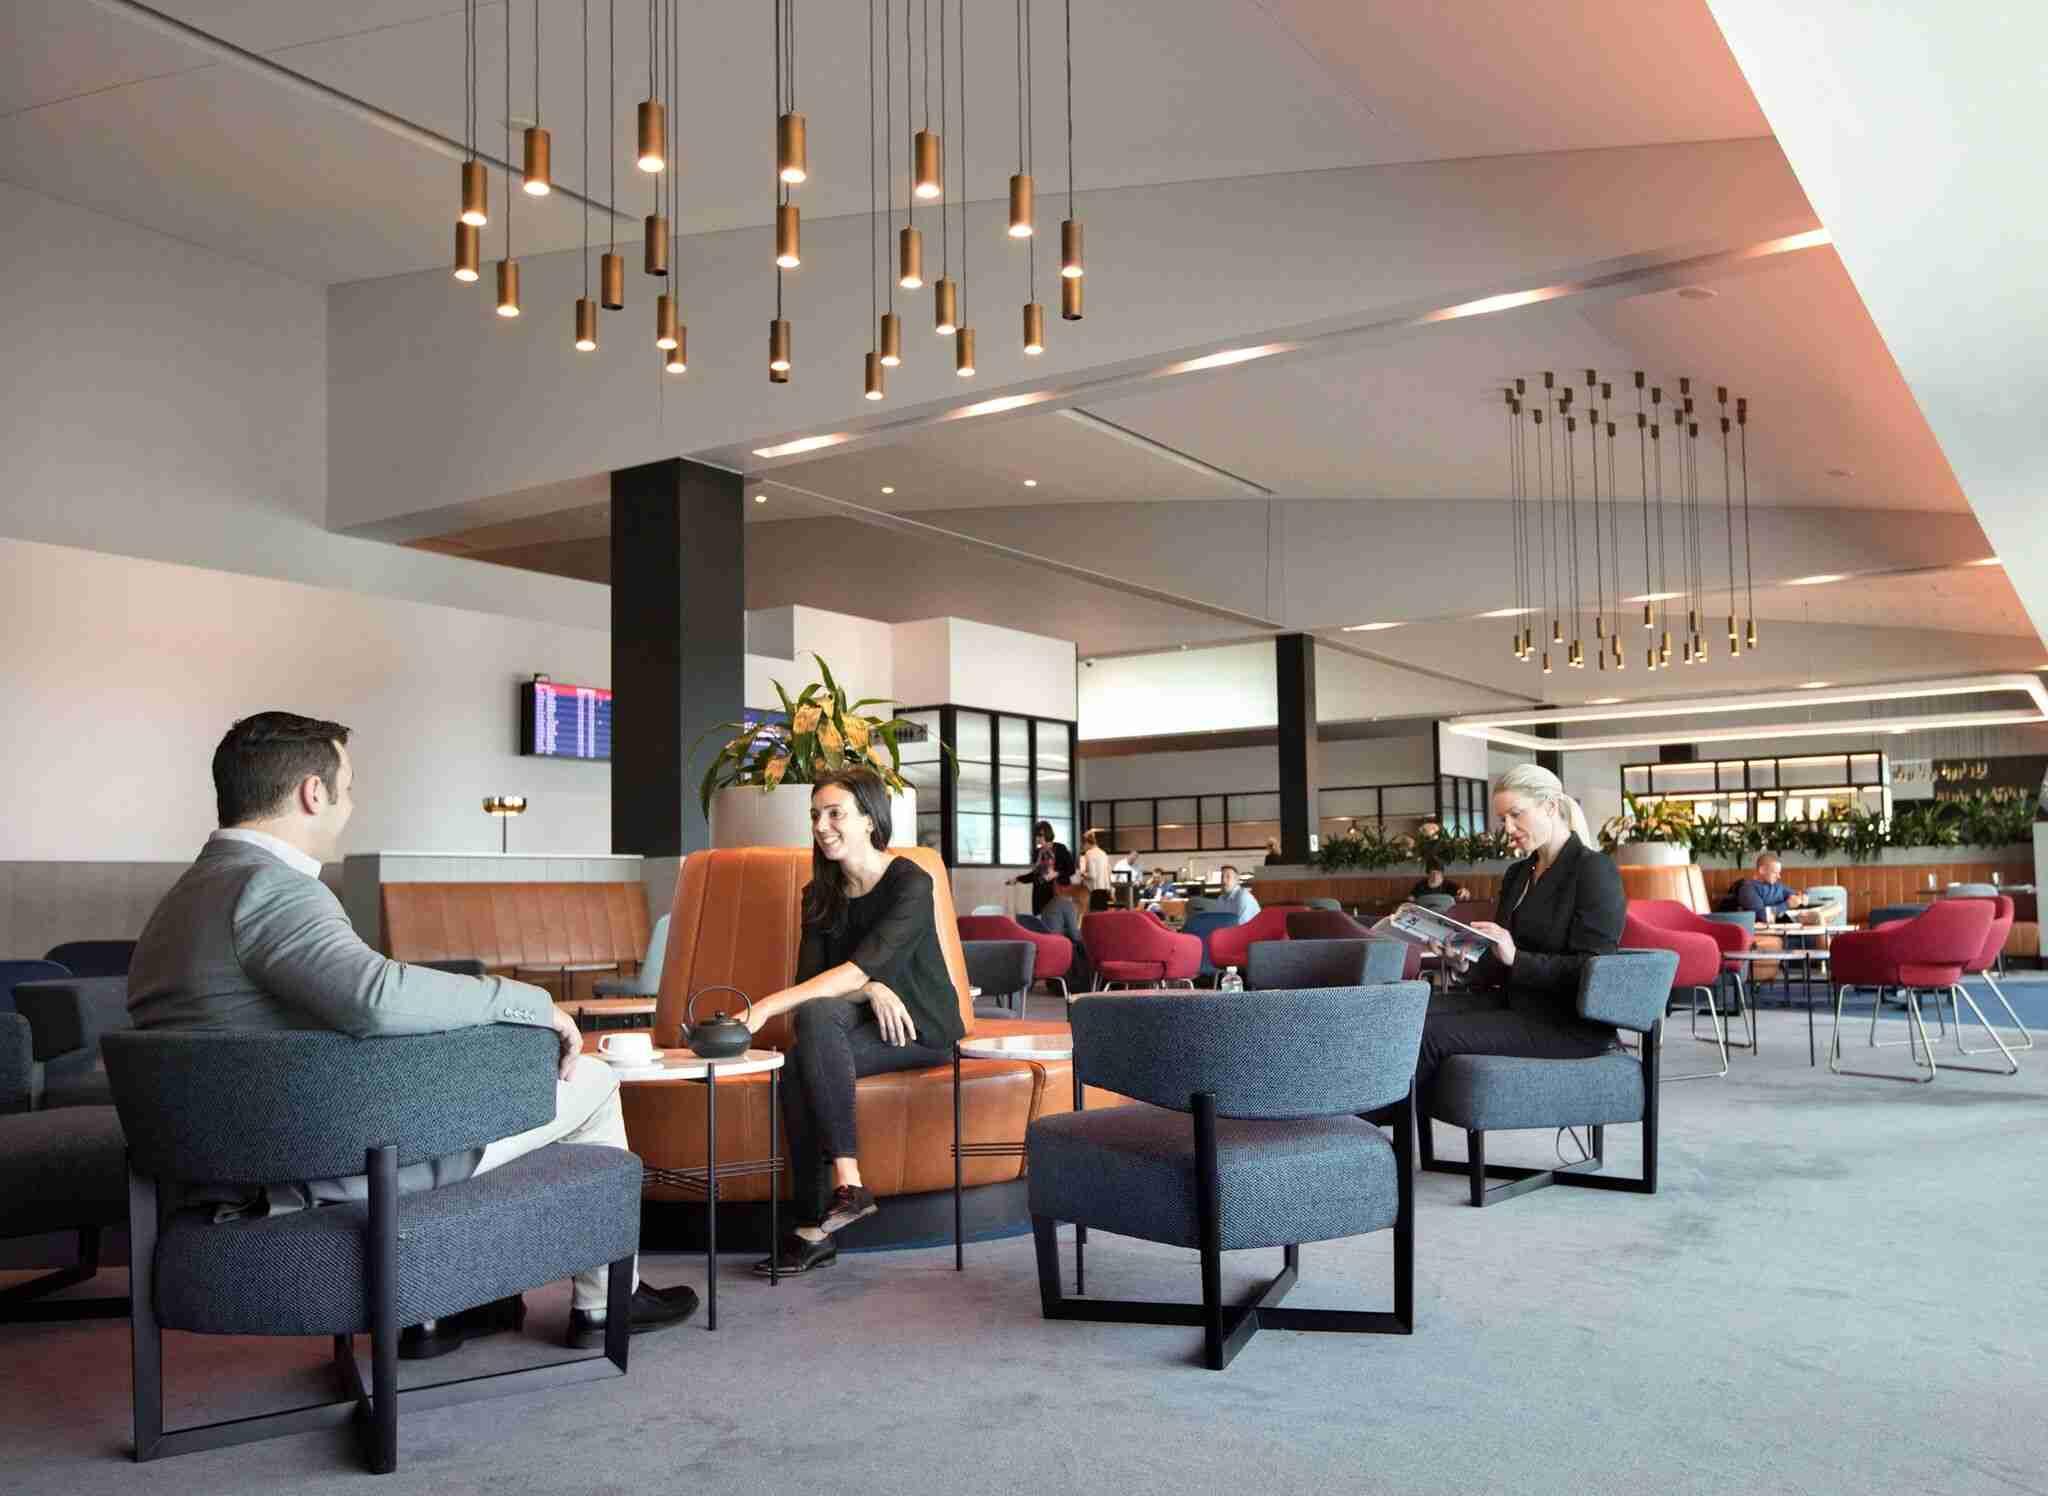 Qantas Business Lounge Melbourne Source: Qantas